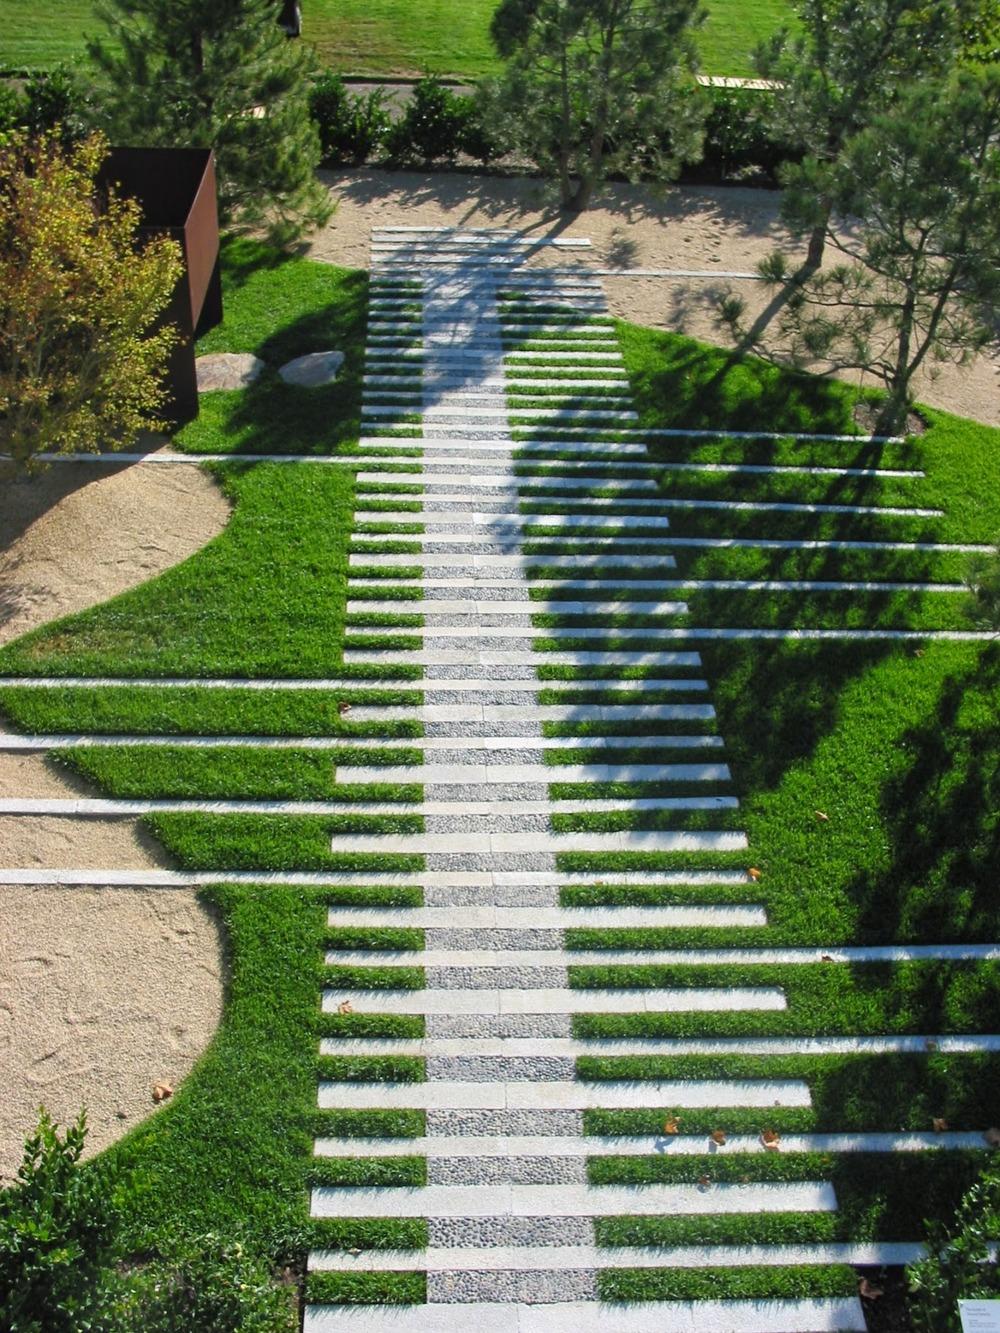 Serenity Garden by Yoji Sasaki